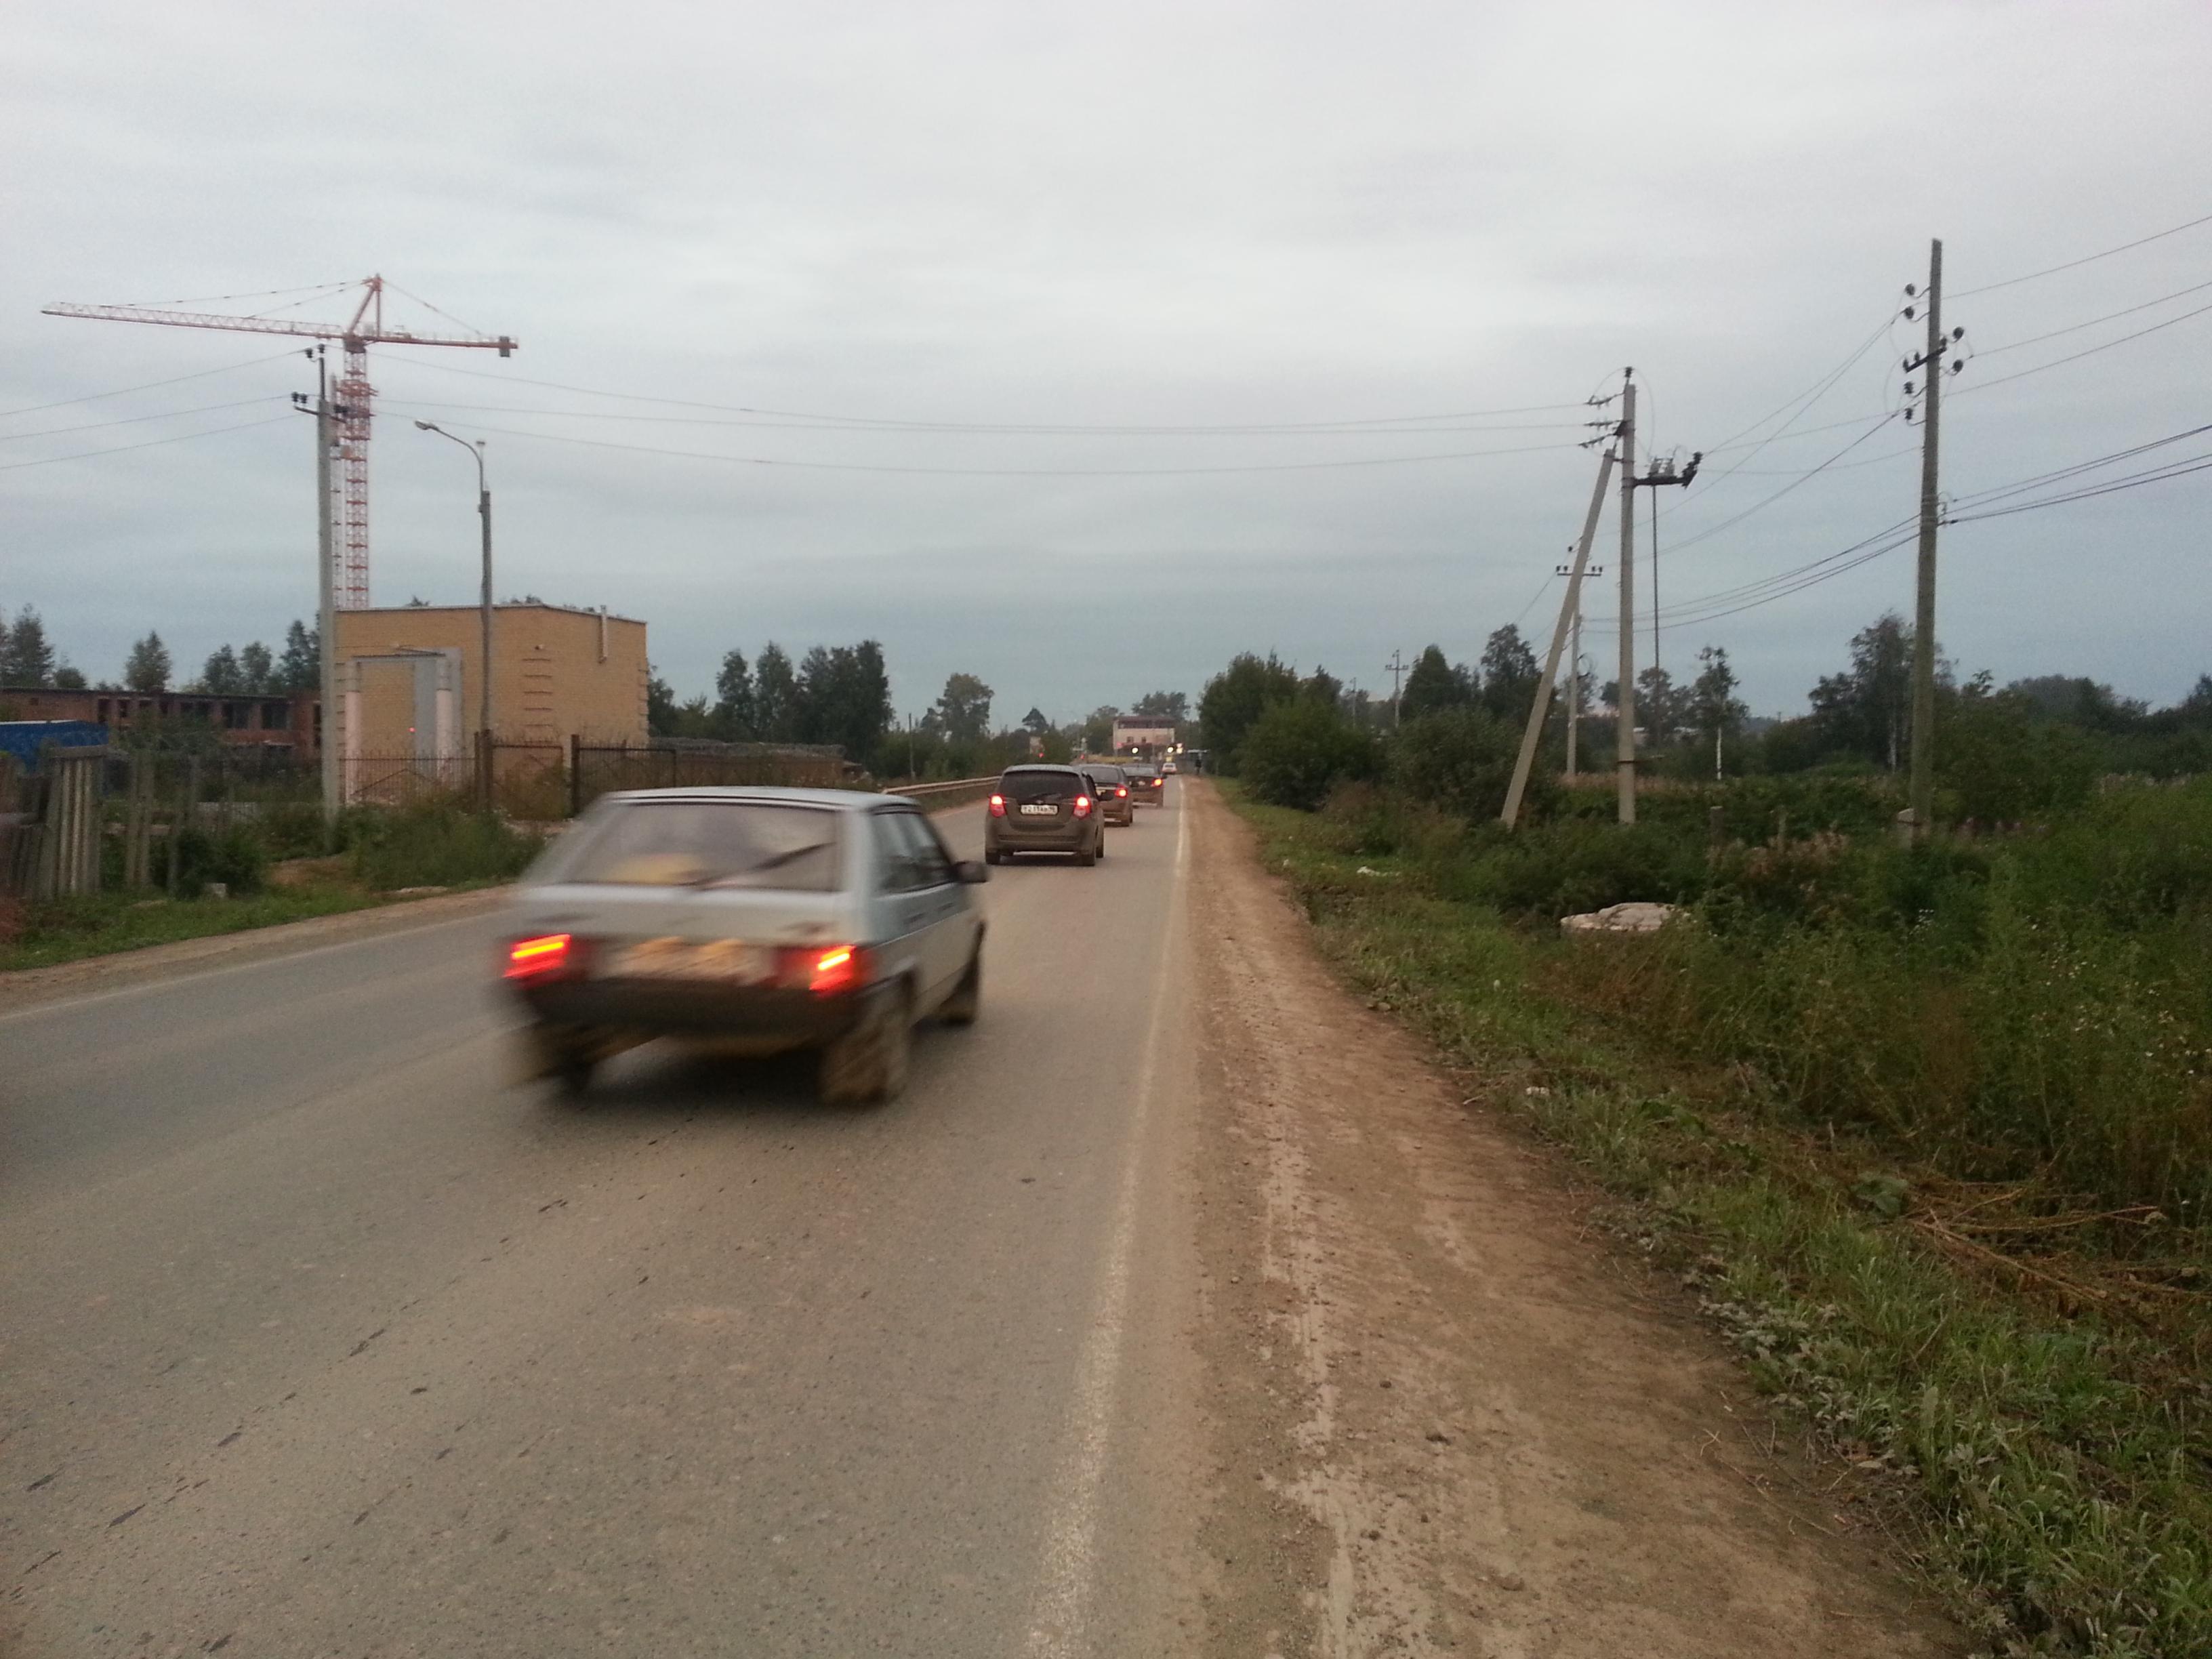 Тротуара не будет, остановки тоже: жителям Широкой Речки отказали в благоустройстве